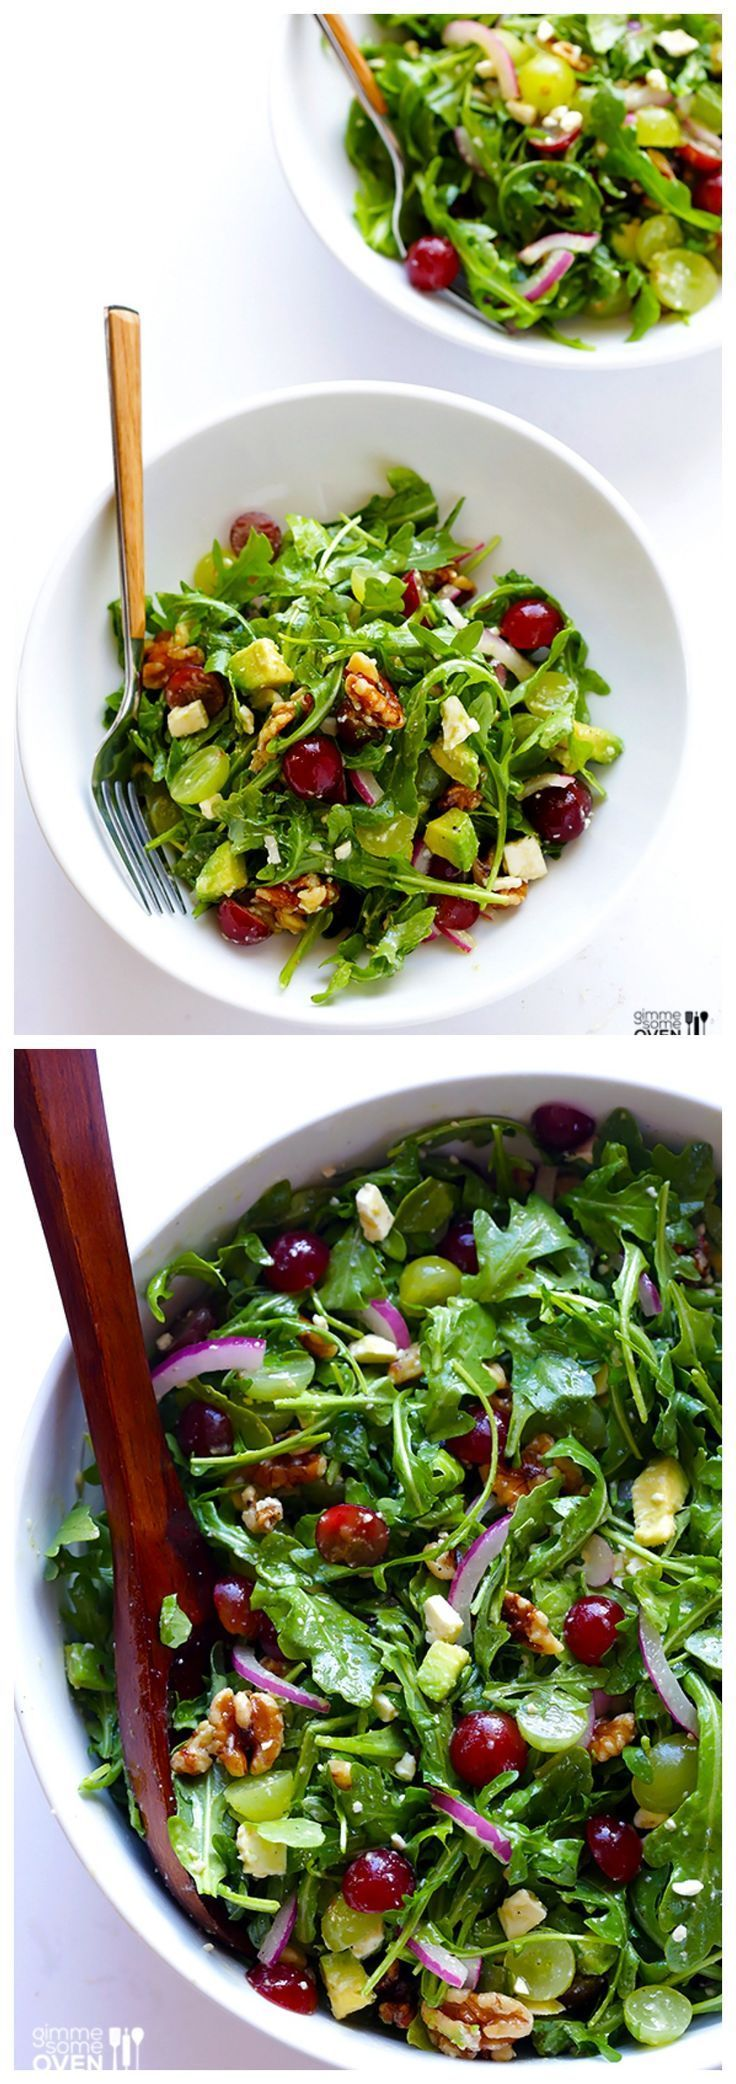 Grape, Avocado & Arugula Salad - simple, fresh, and full of sweet flavor.